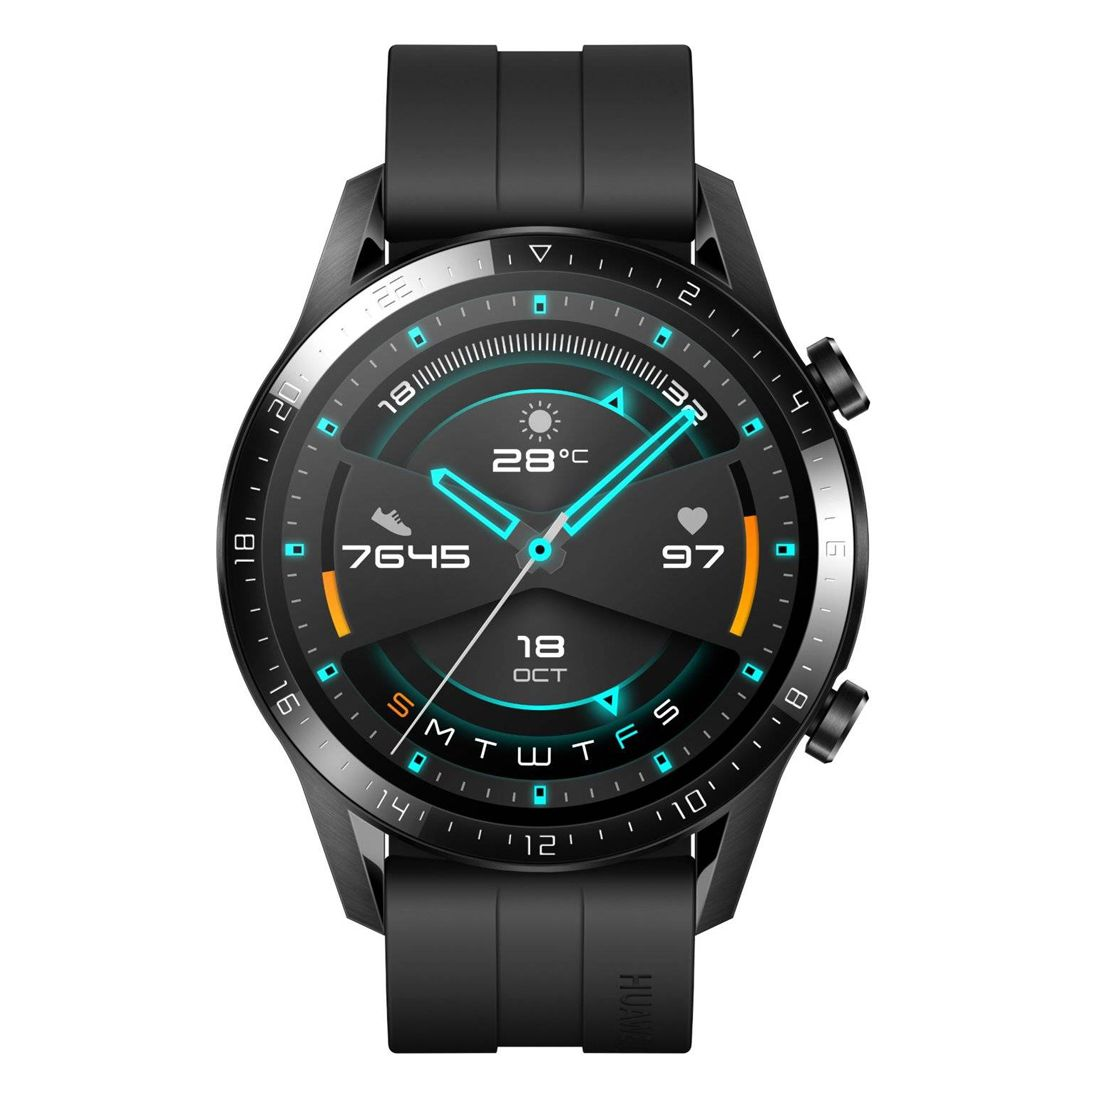 Huawei Watch GT 2 Sport 46mm Smartwatch - Matte Black